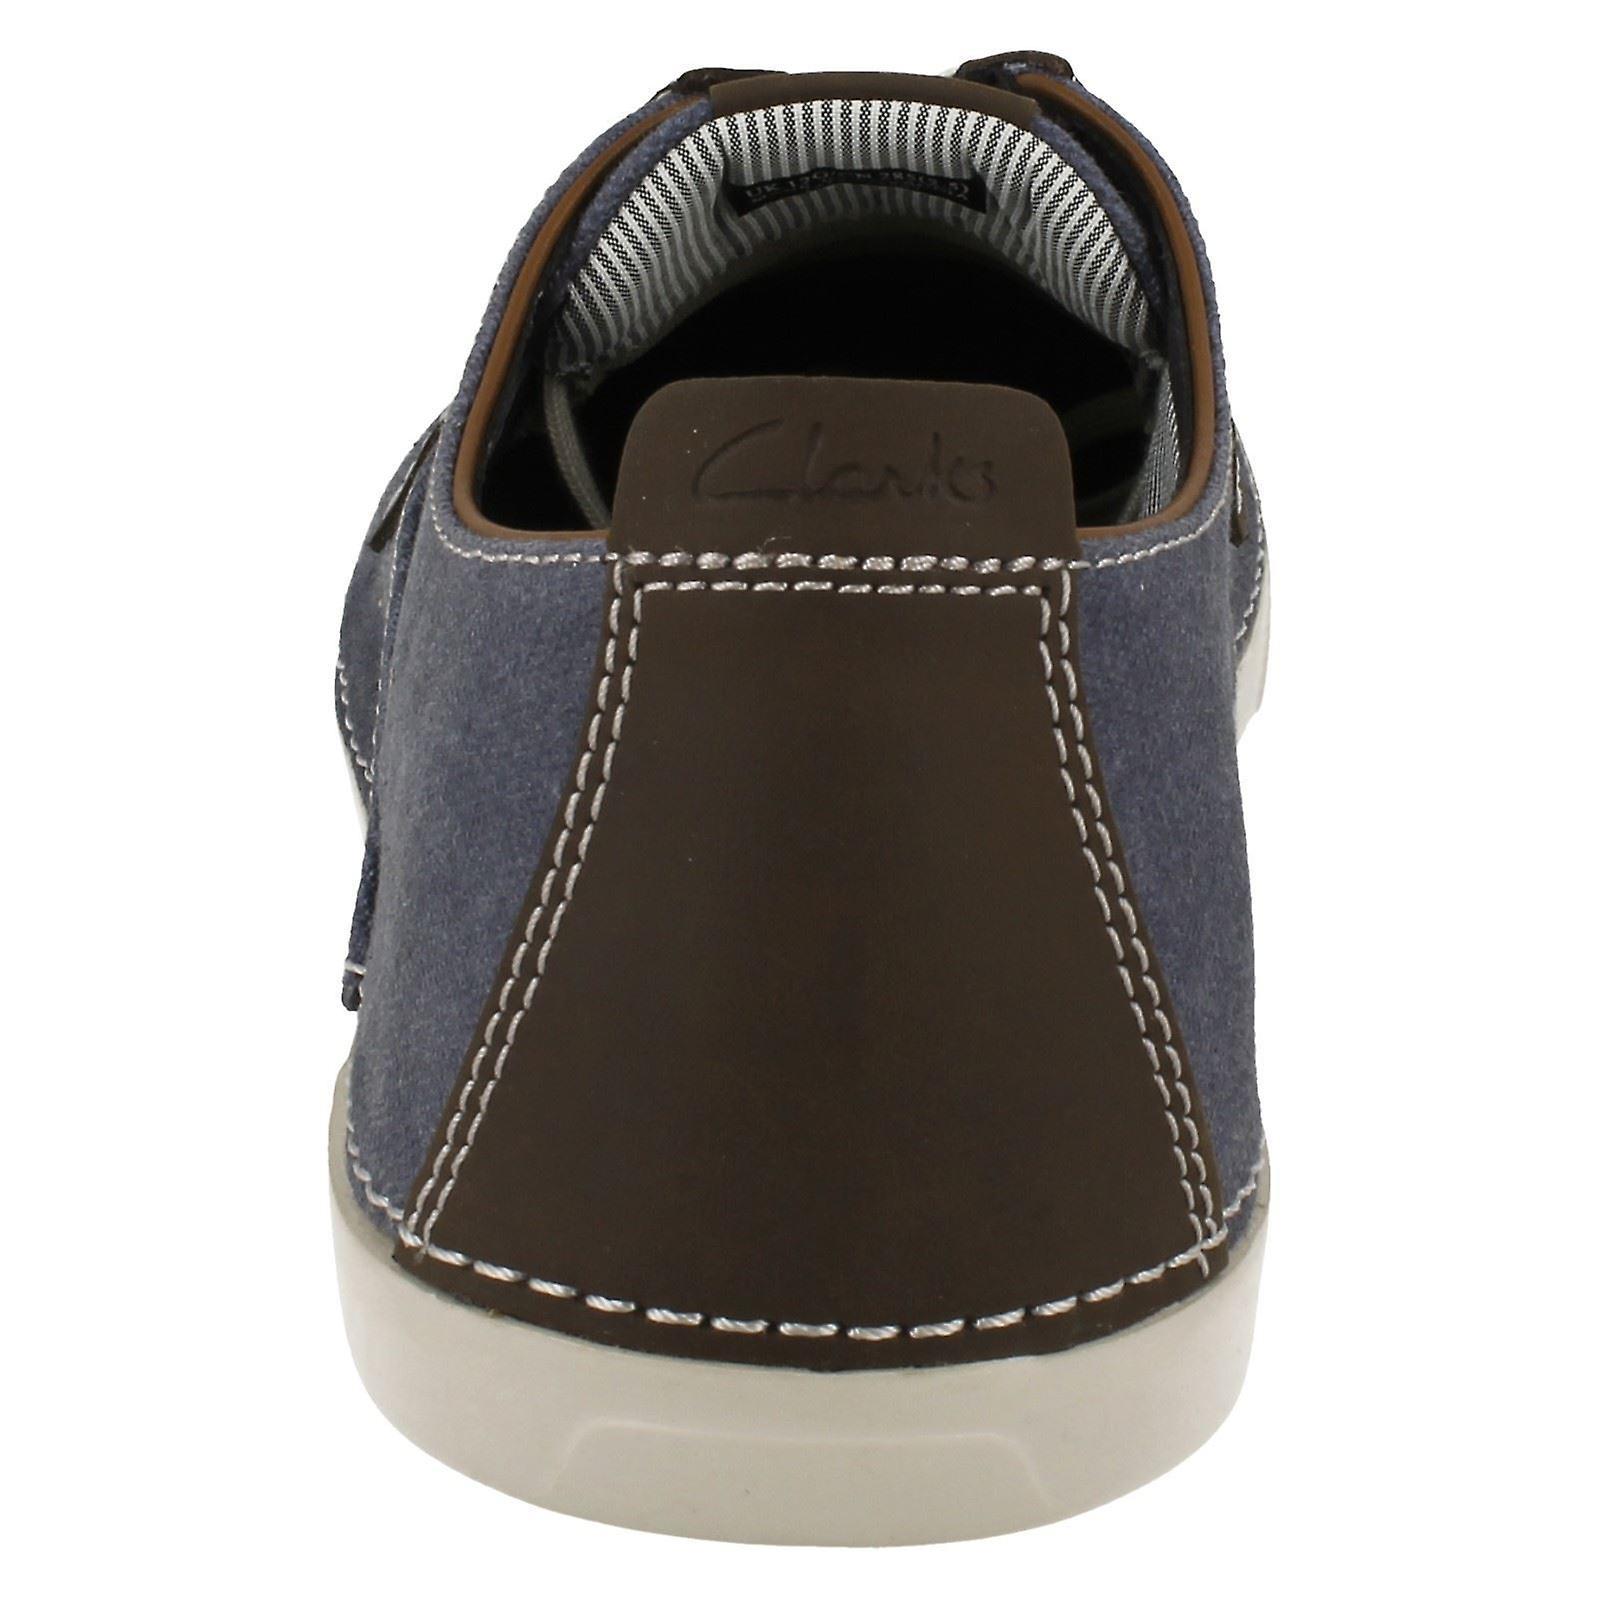 Mens Clarks Casual Shoes Neelix Vibe